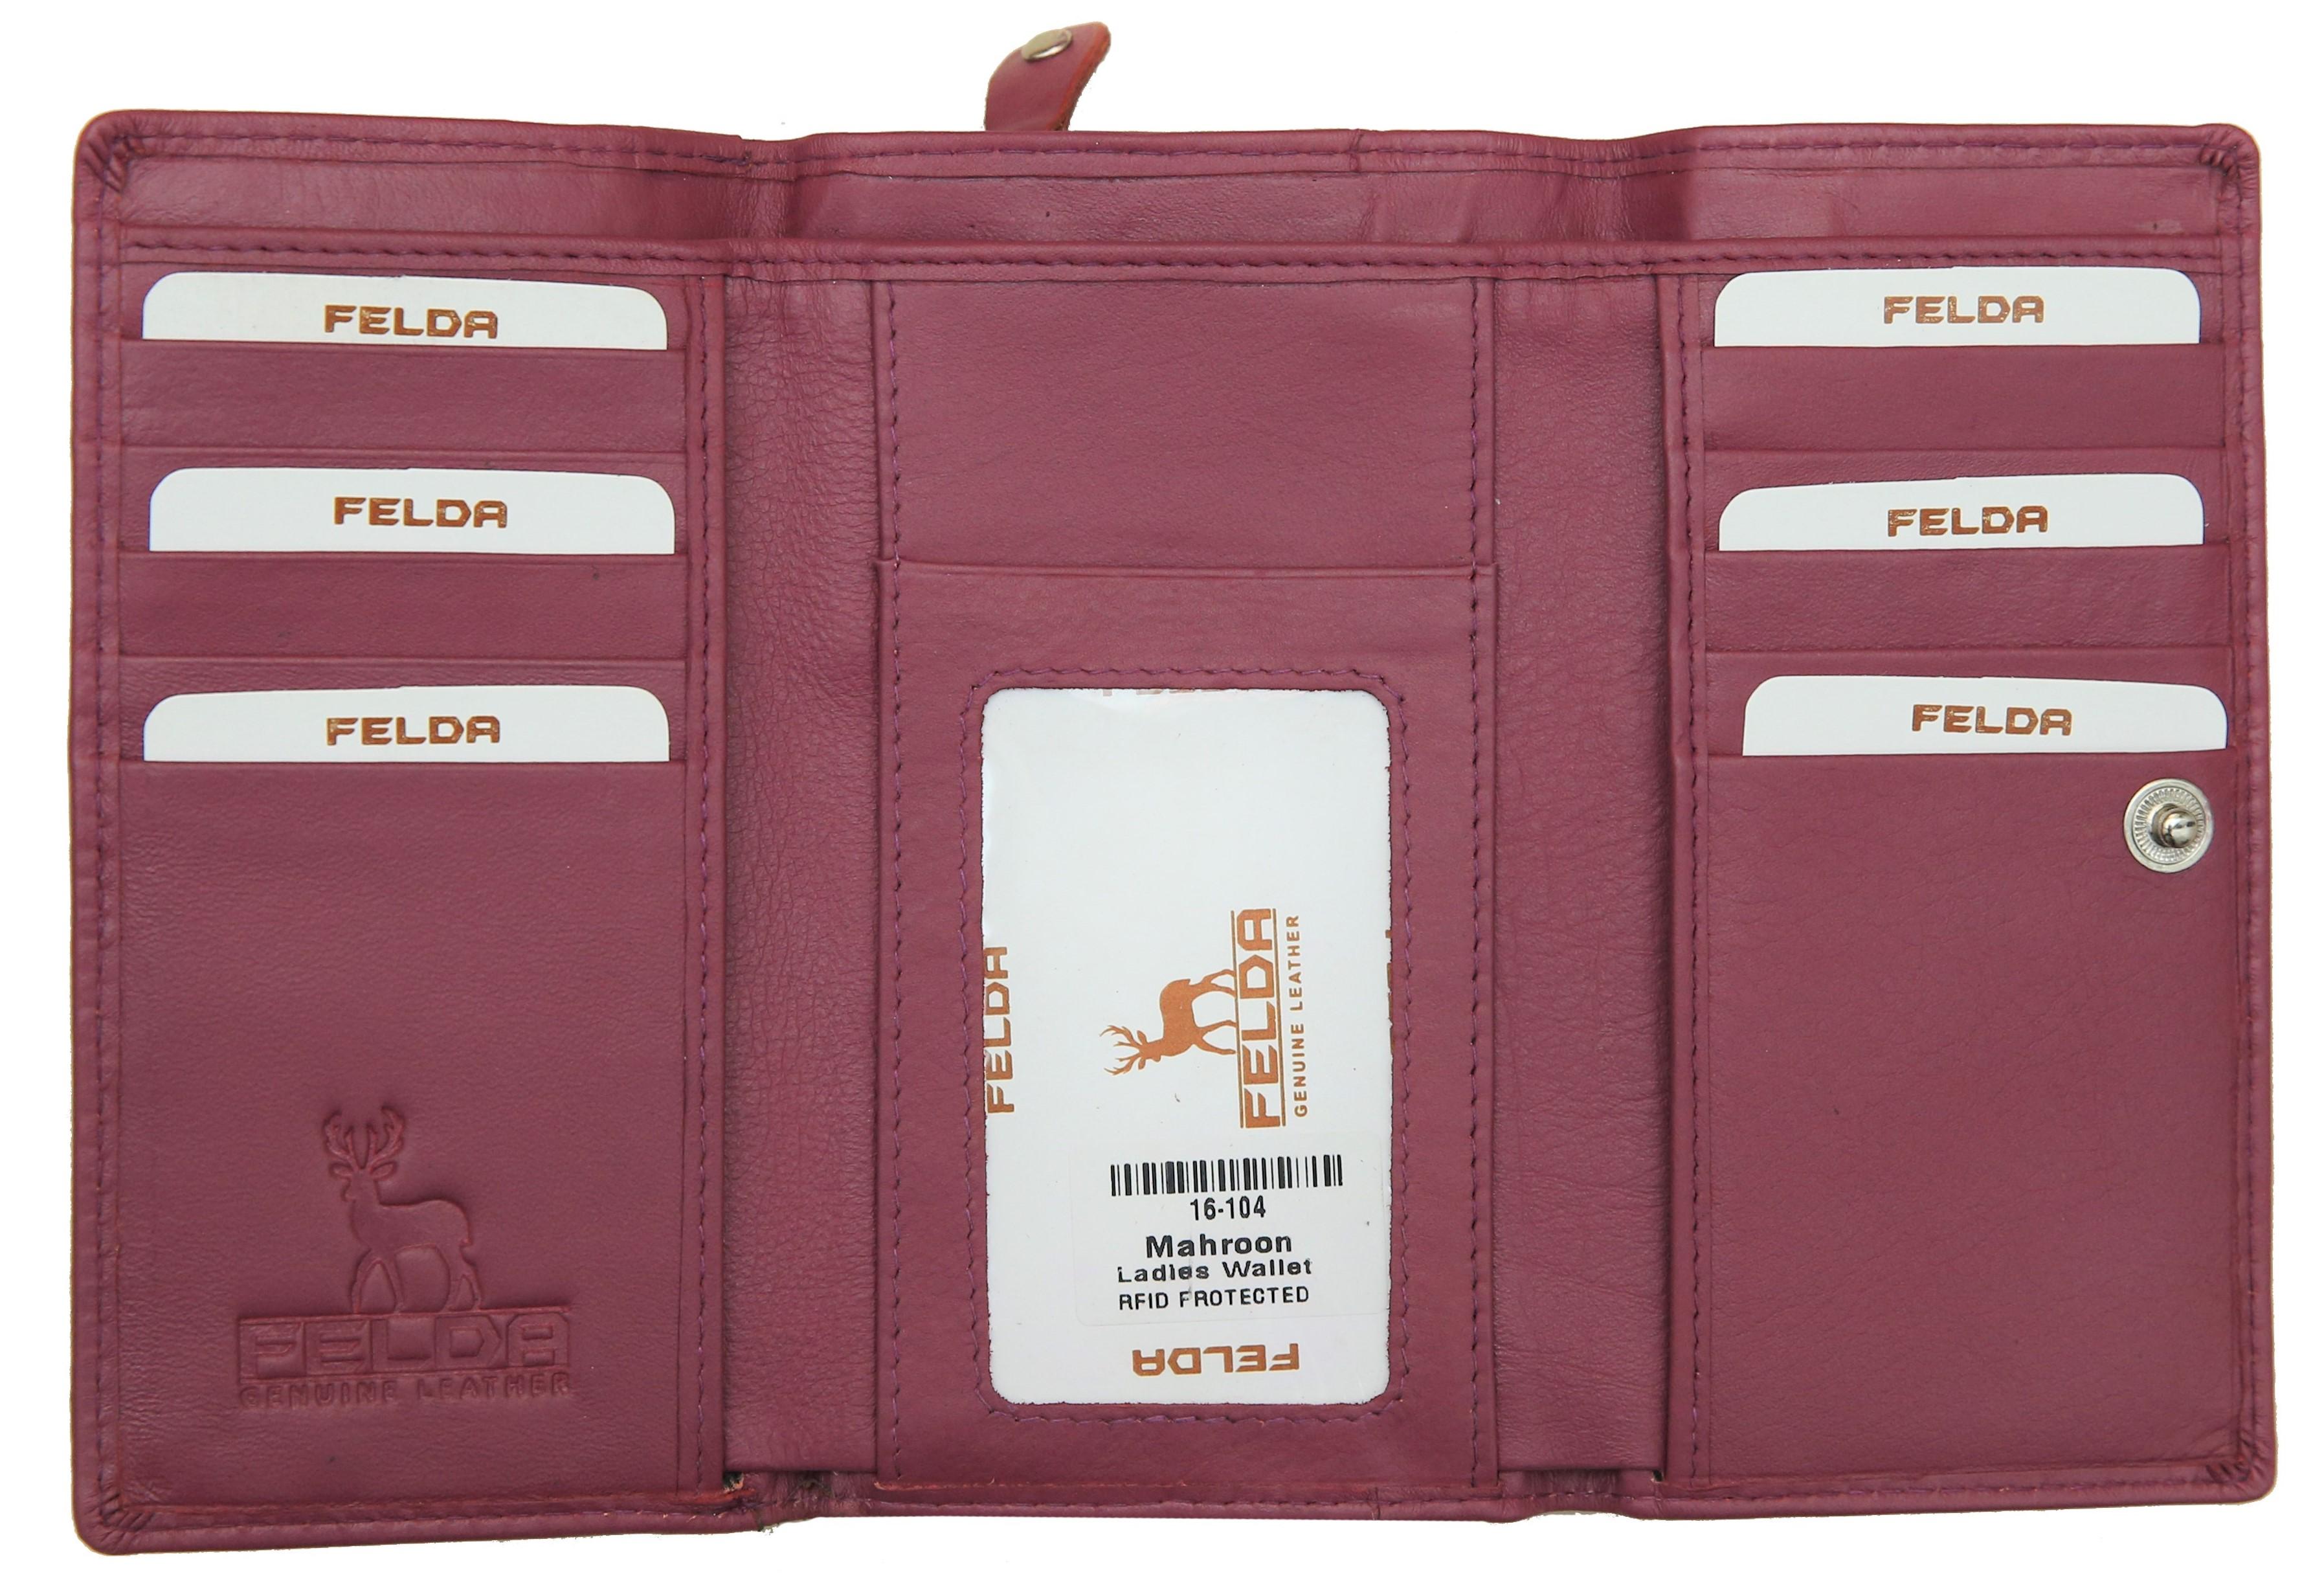 Felda-Portefeuille-pour-cartes-de-credit-cuir-souple-plusieurs-coloris miniature 20